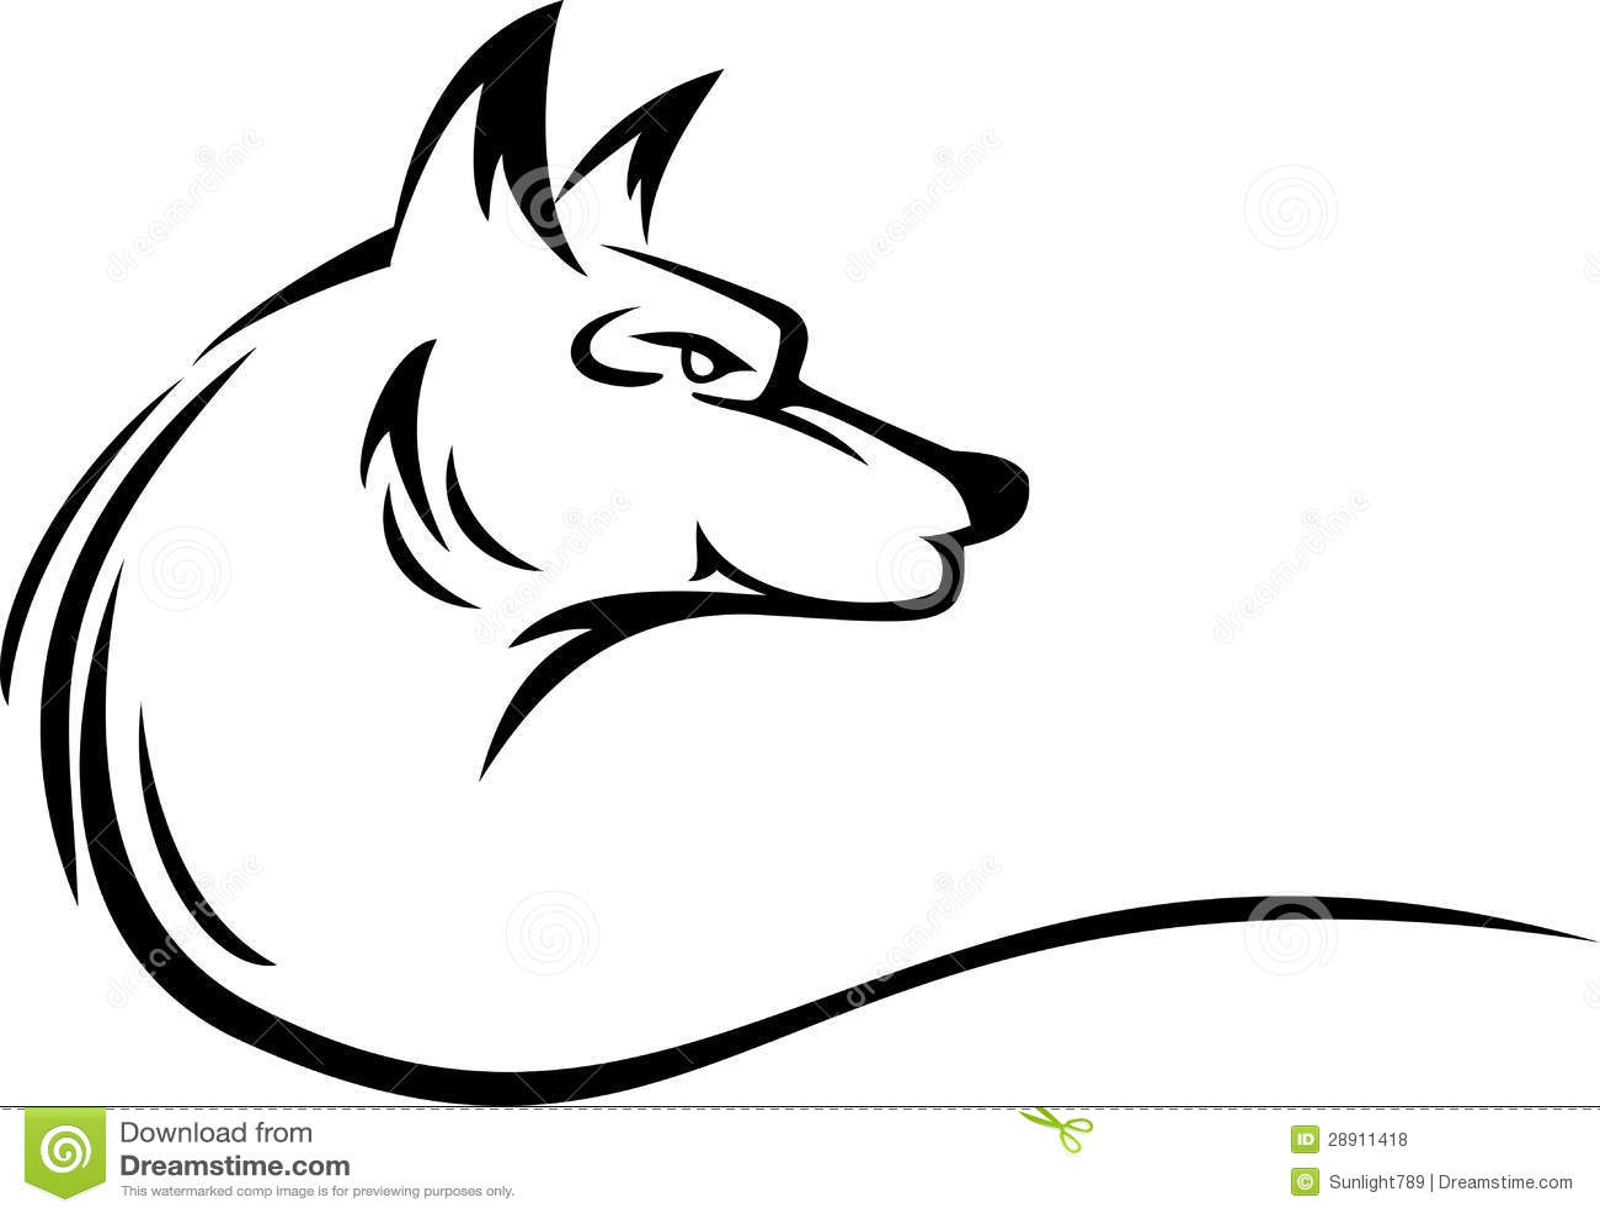 Wolf Head Tattoo Royalty Free Stock Photos Image 28911418